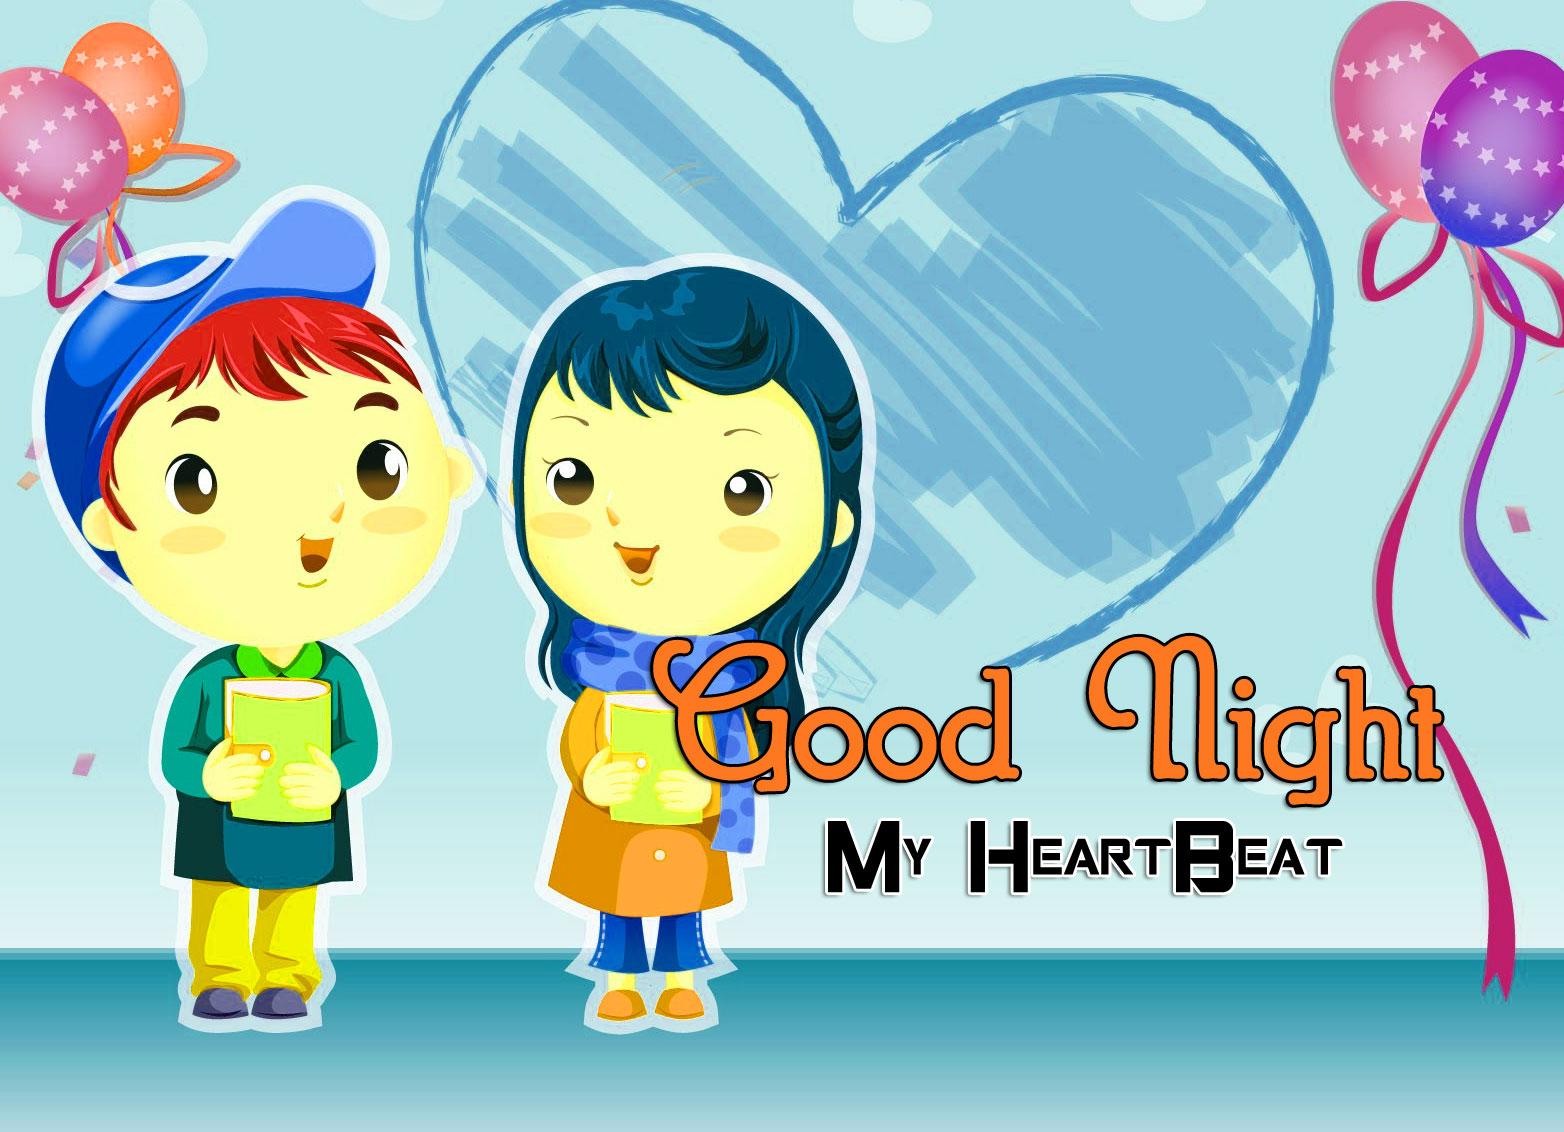 Girlfriend Good Night Wishes Wallpaper With Cartoon